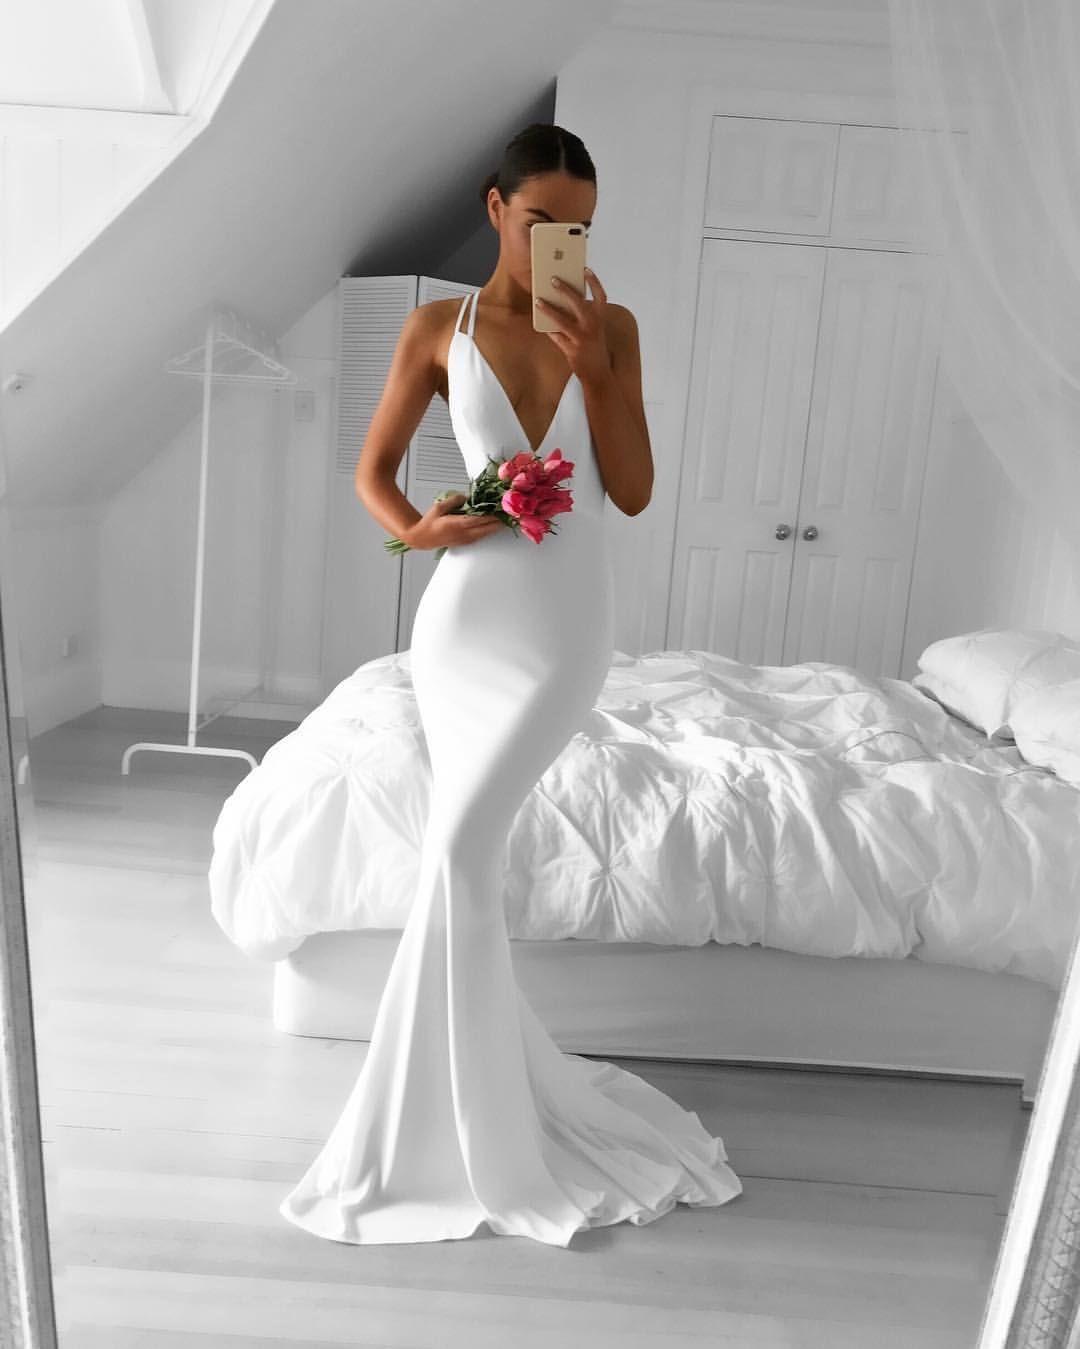 White mermaid prom dressdeep v prom dressfashion prom dresssexy